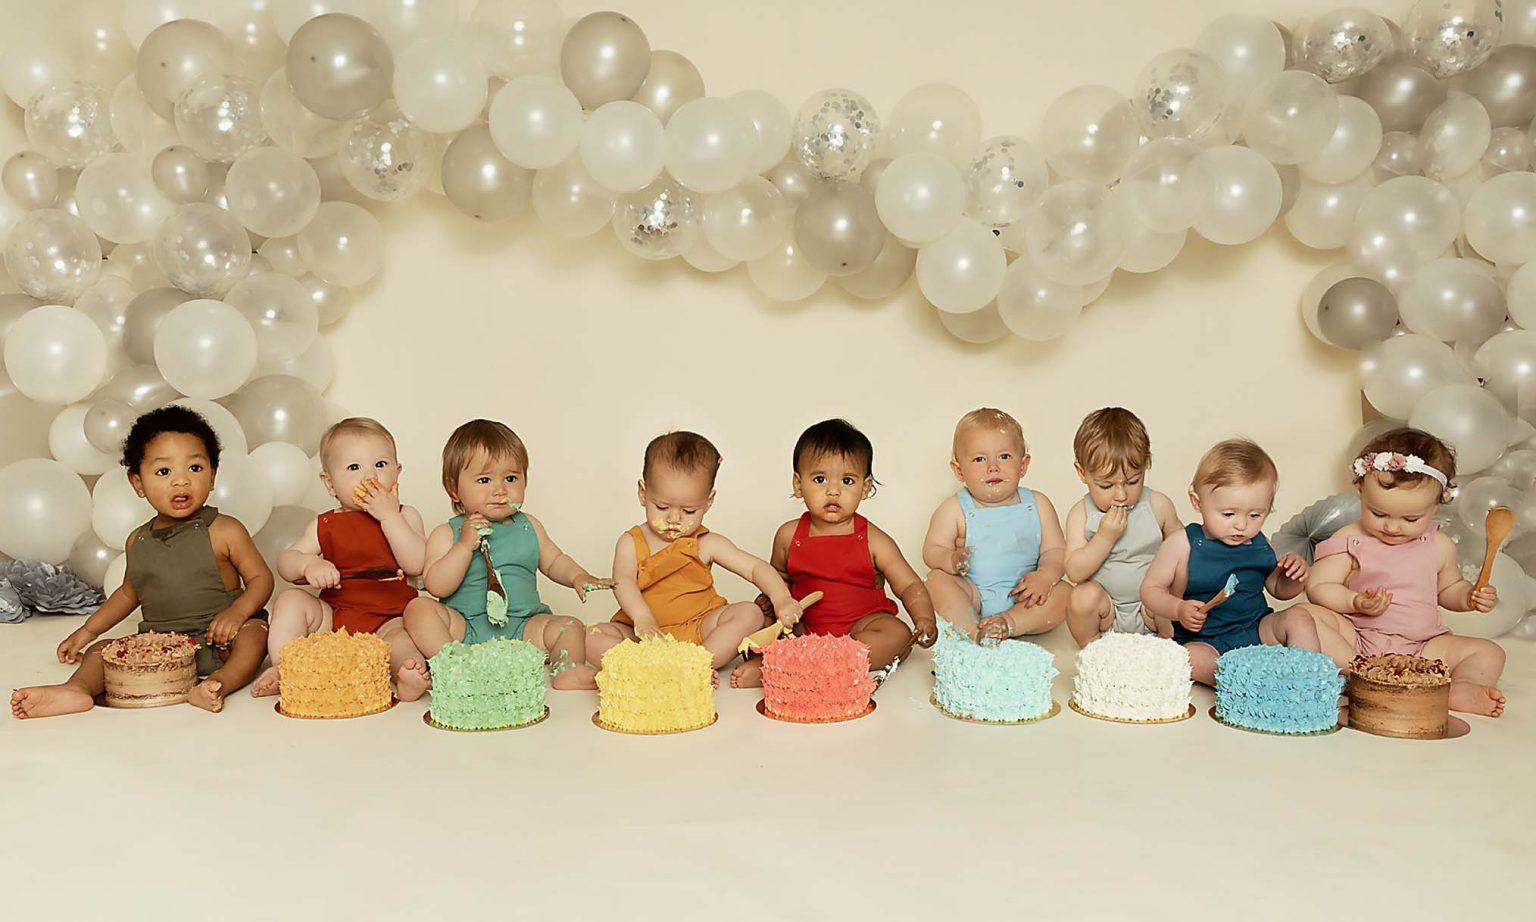 Group cake smash photography for boys and girls